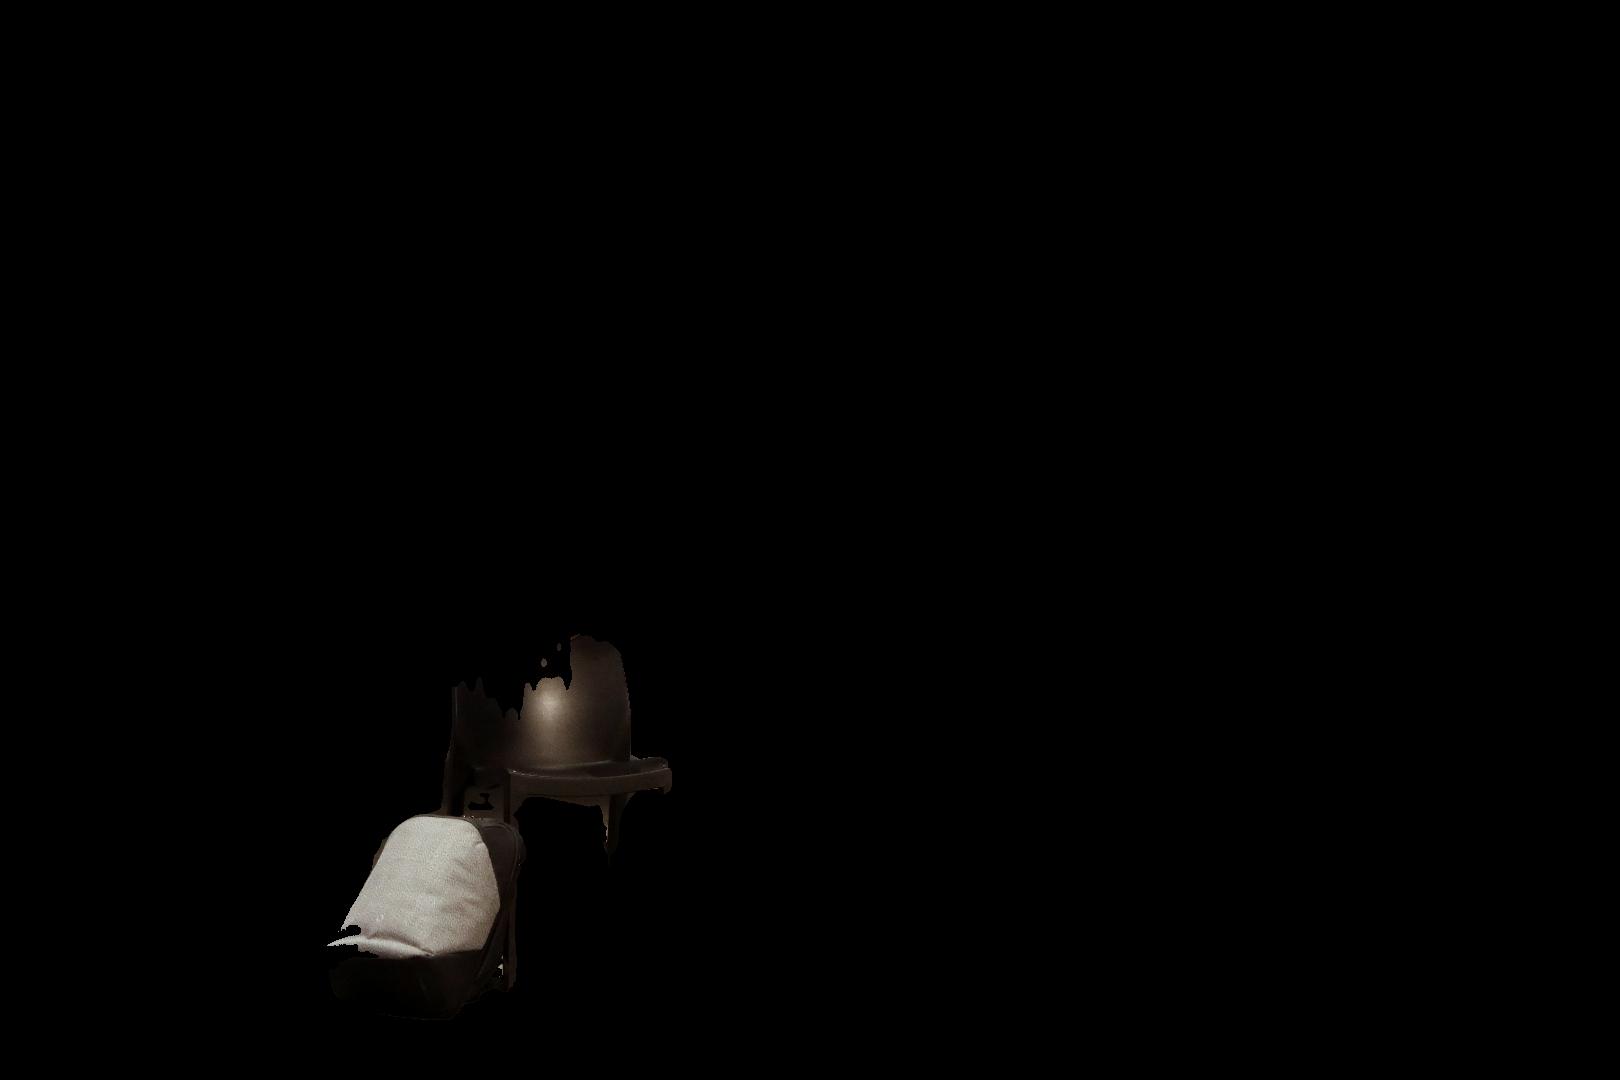 3_composite_chair.jpg